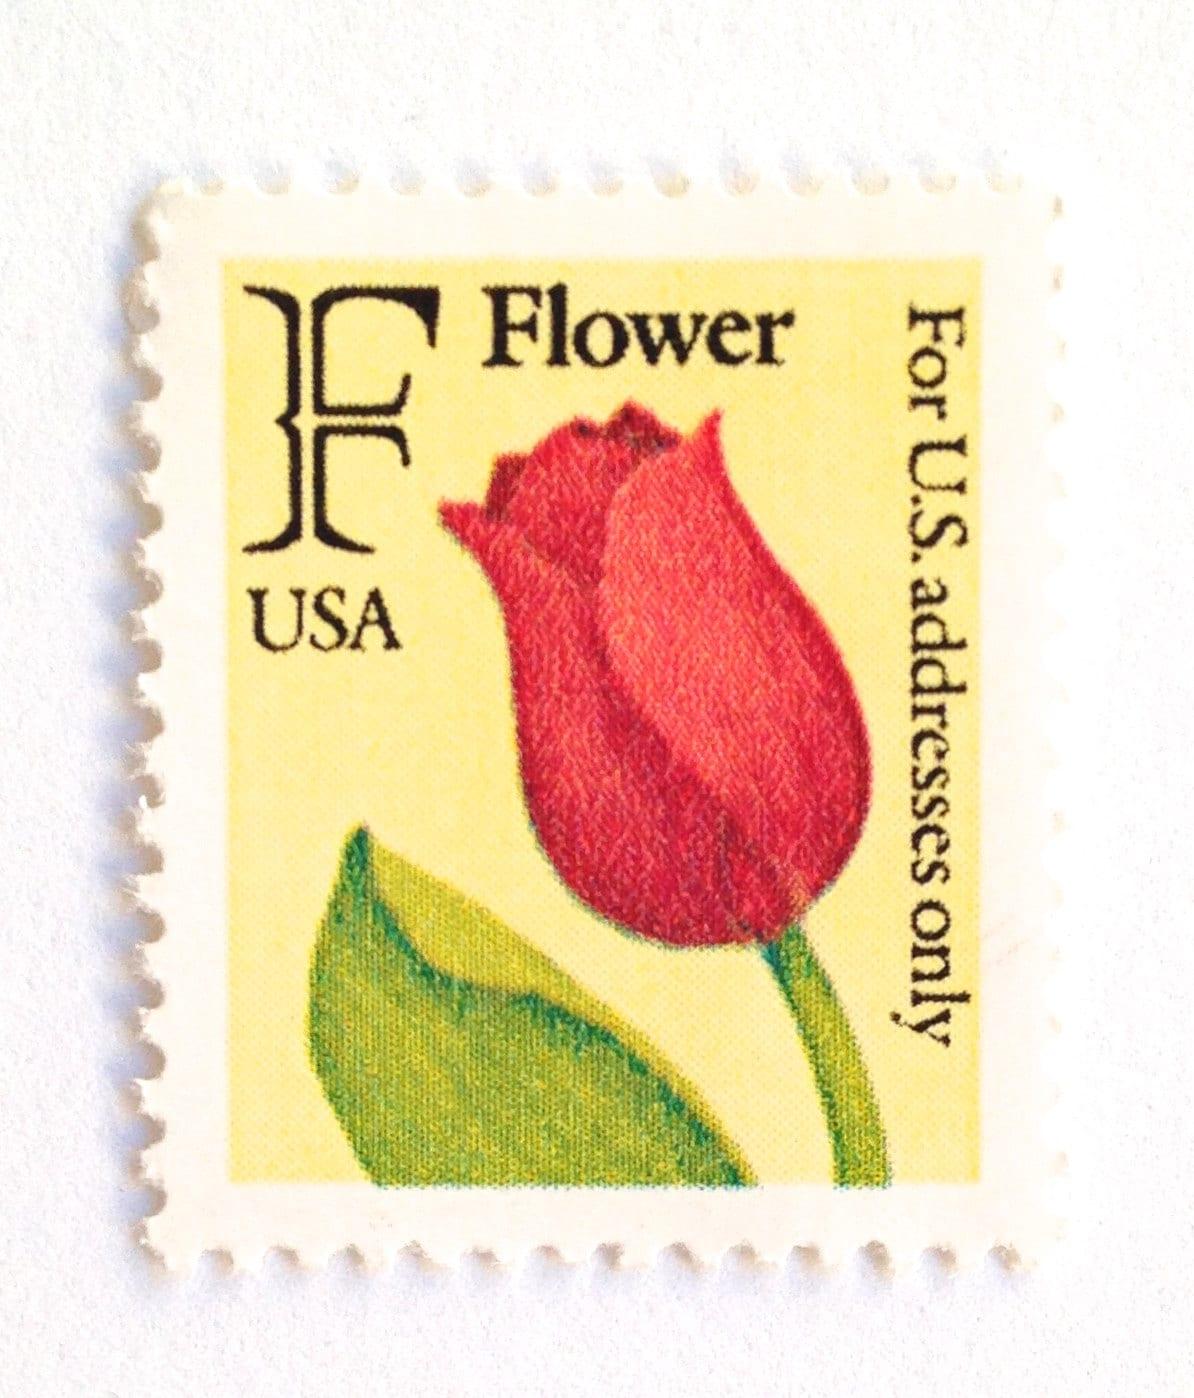 10 UNused Vintage Tulip Postage Stamps 29 Cent Red Tulip | Etsy